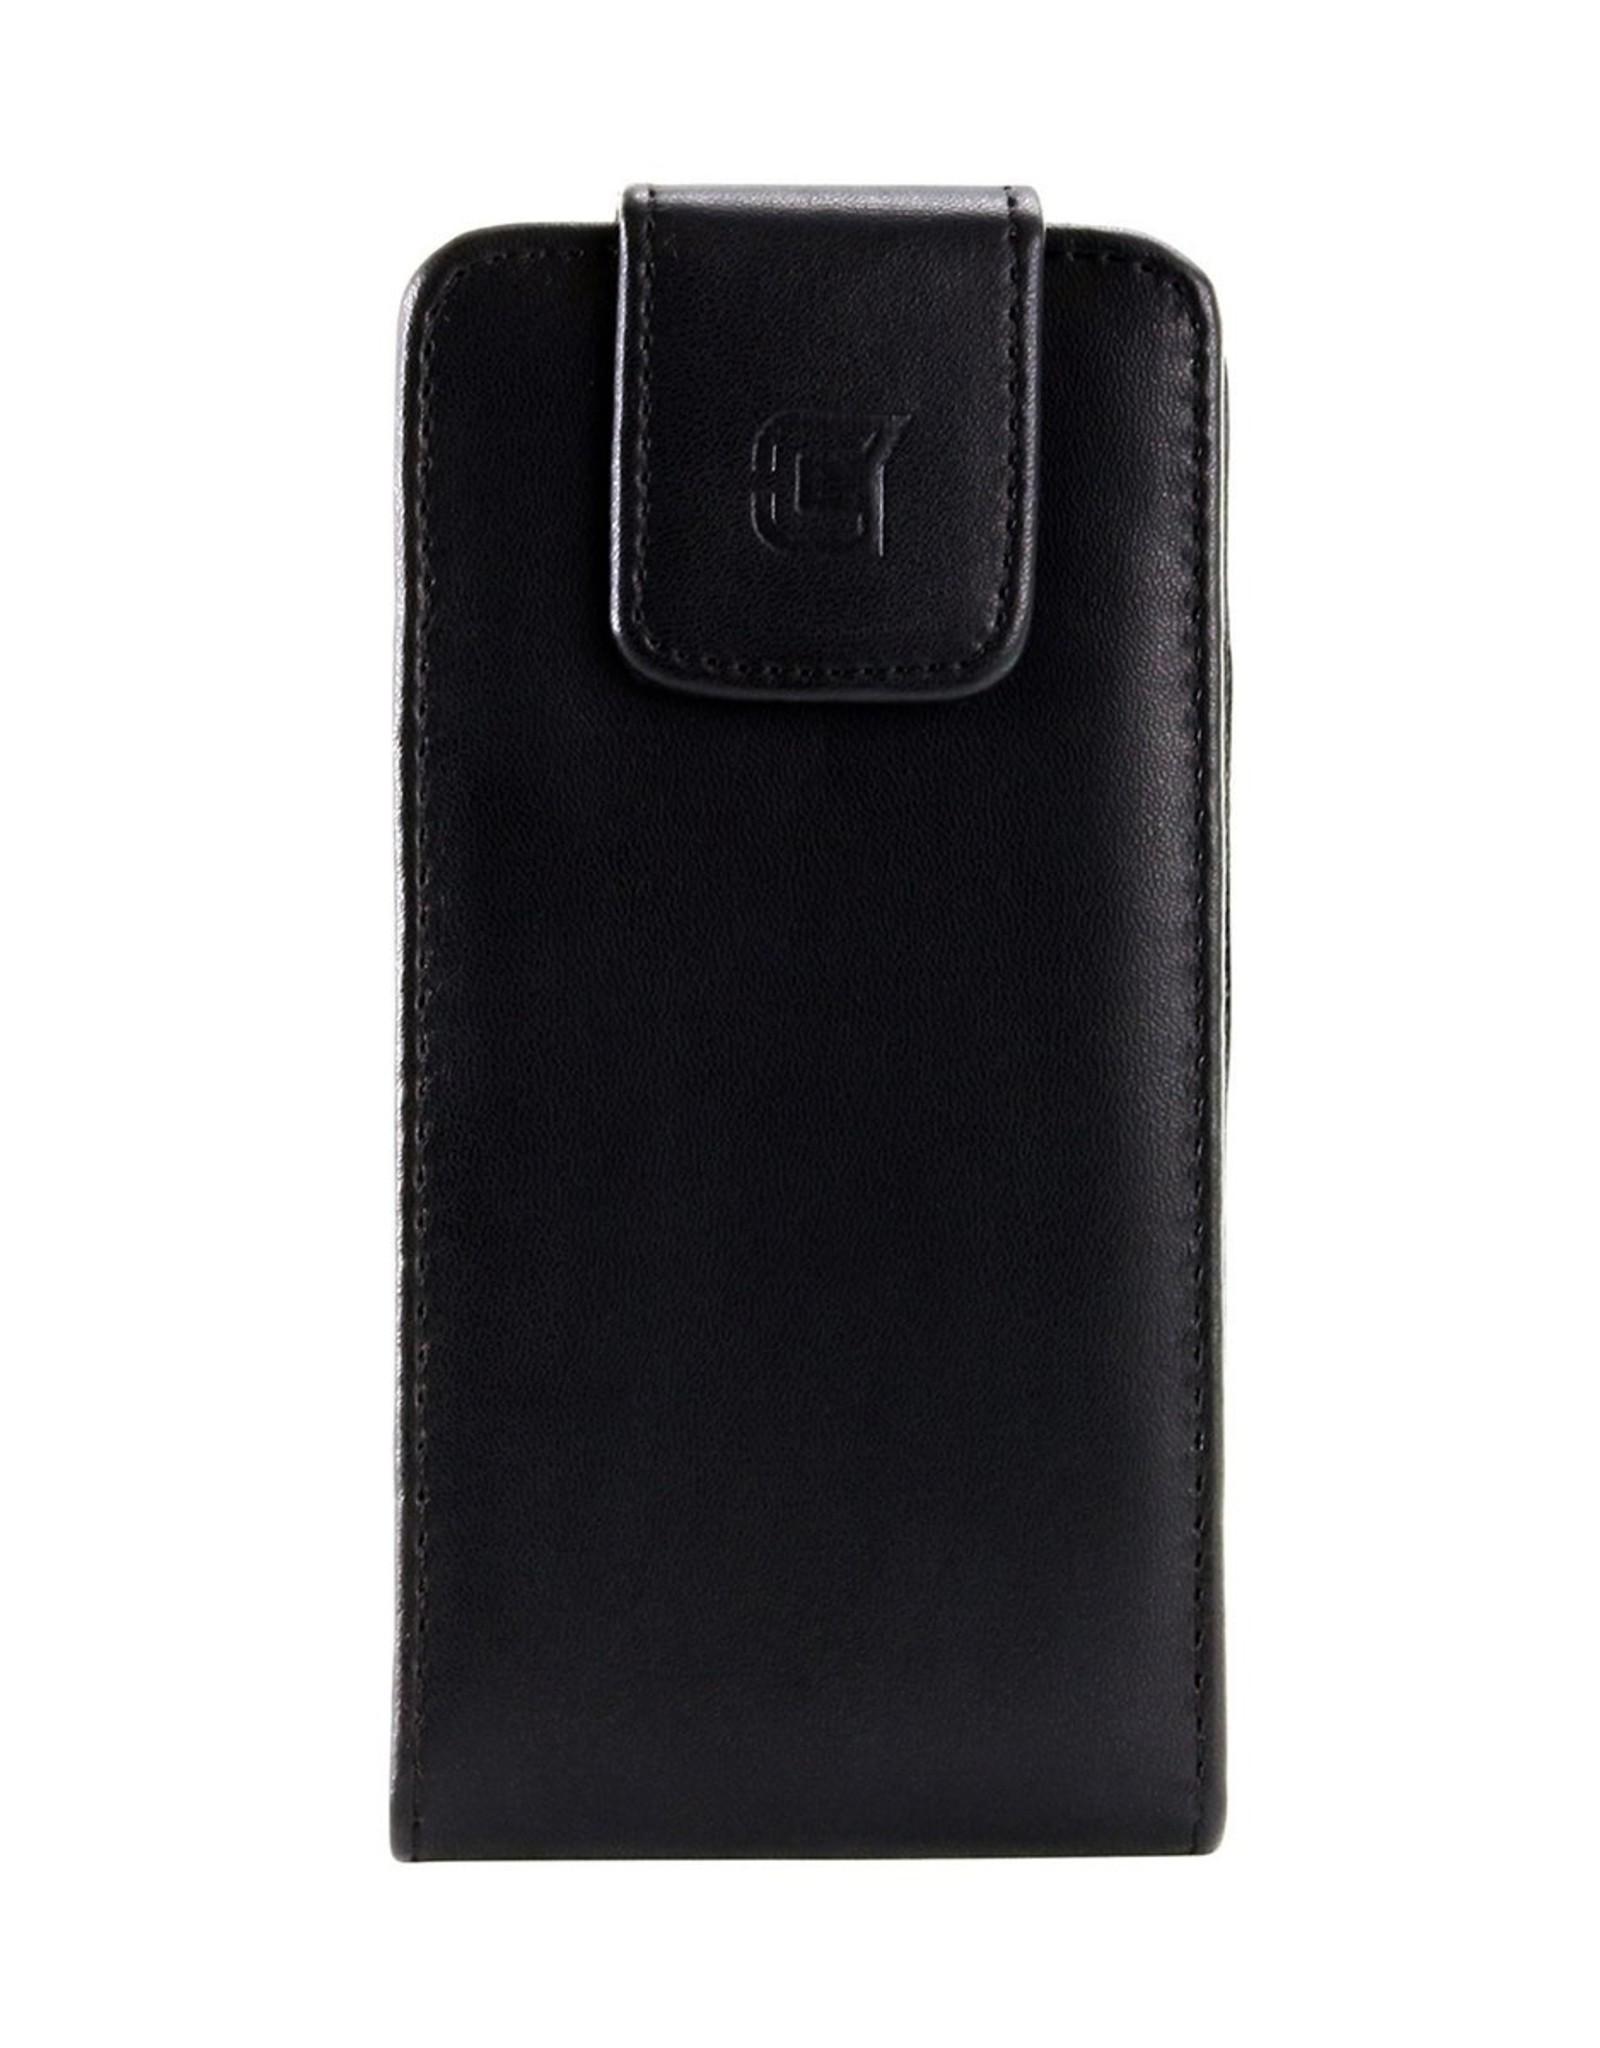 Caseco Caseco | Faux Leather Vertical Pouch w/ 360 Belt Clip - 6.5in CC-FL-PCH-6.5